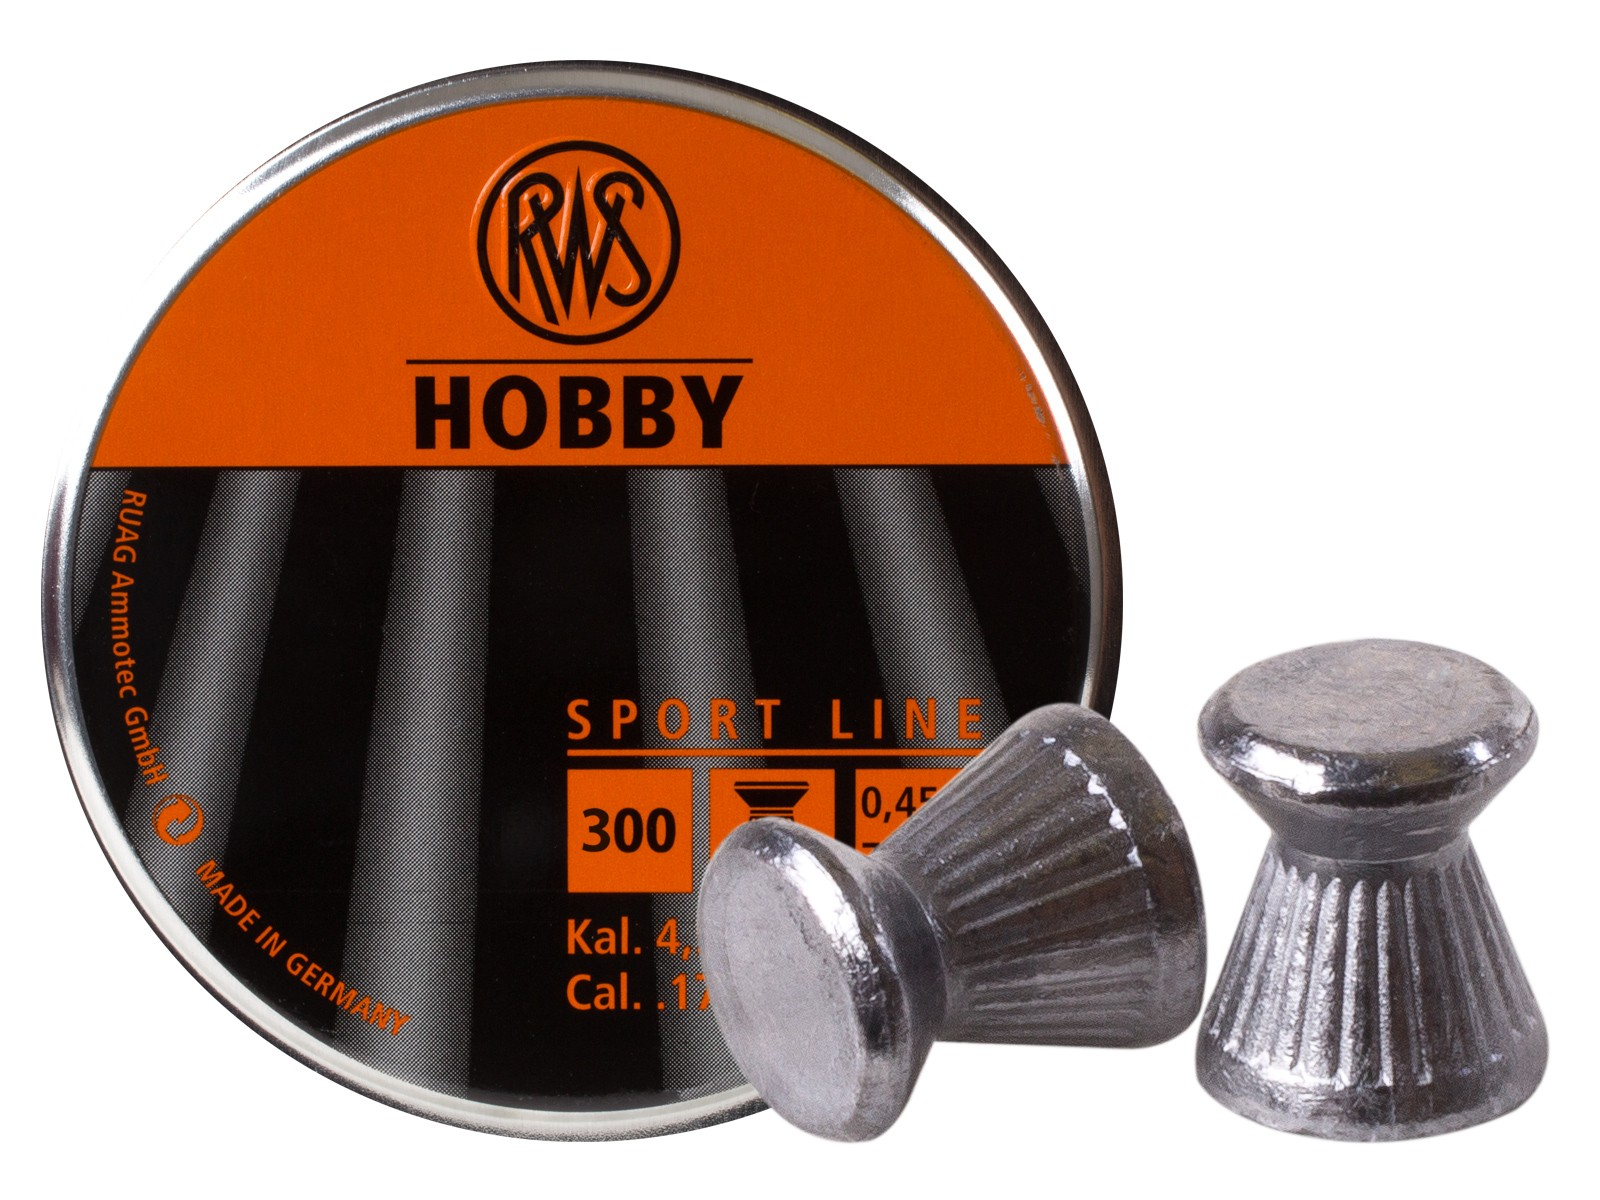 RWS Hobby .177 Cal, 7.0 Grains, Wadcutter, 300ct